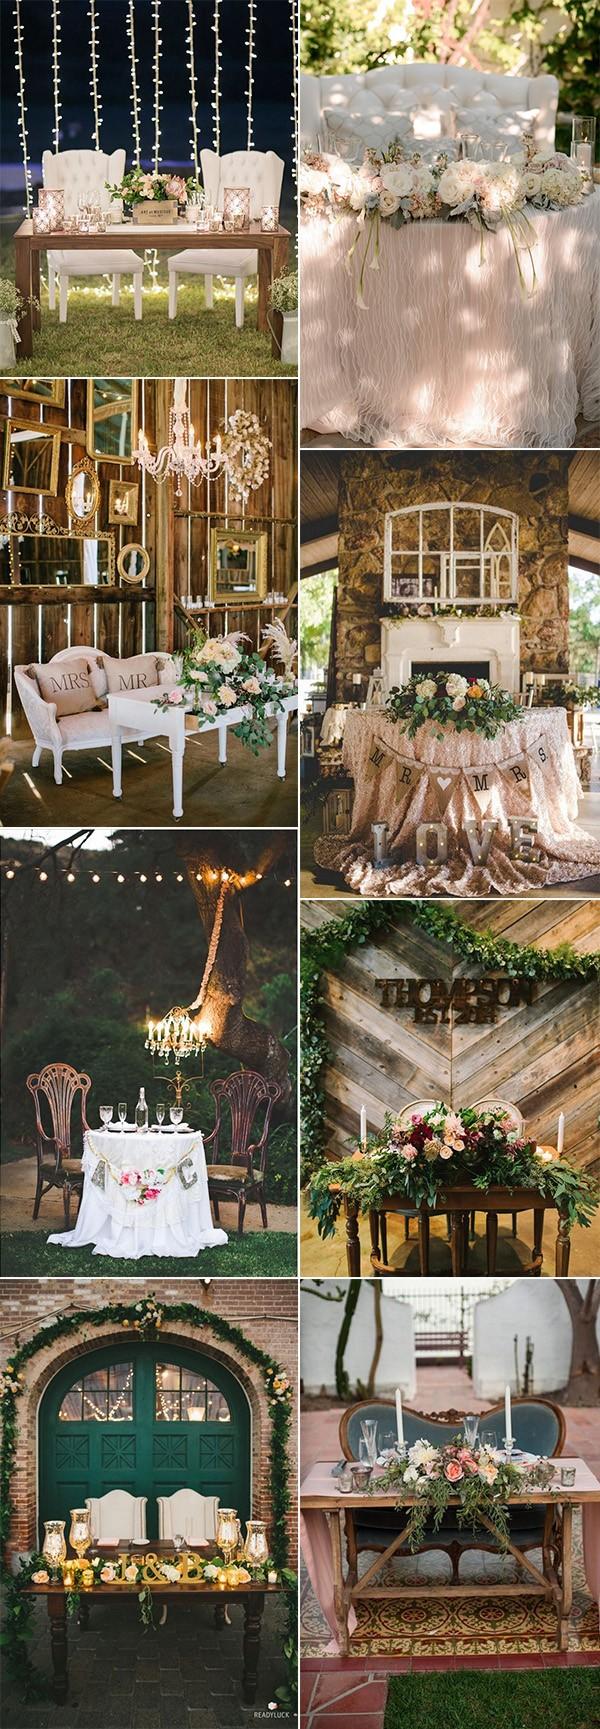 2018 trending vintage sweetheart table decoration ideas